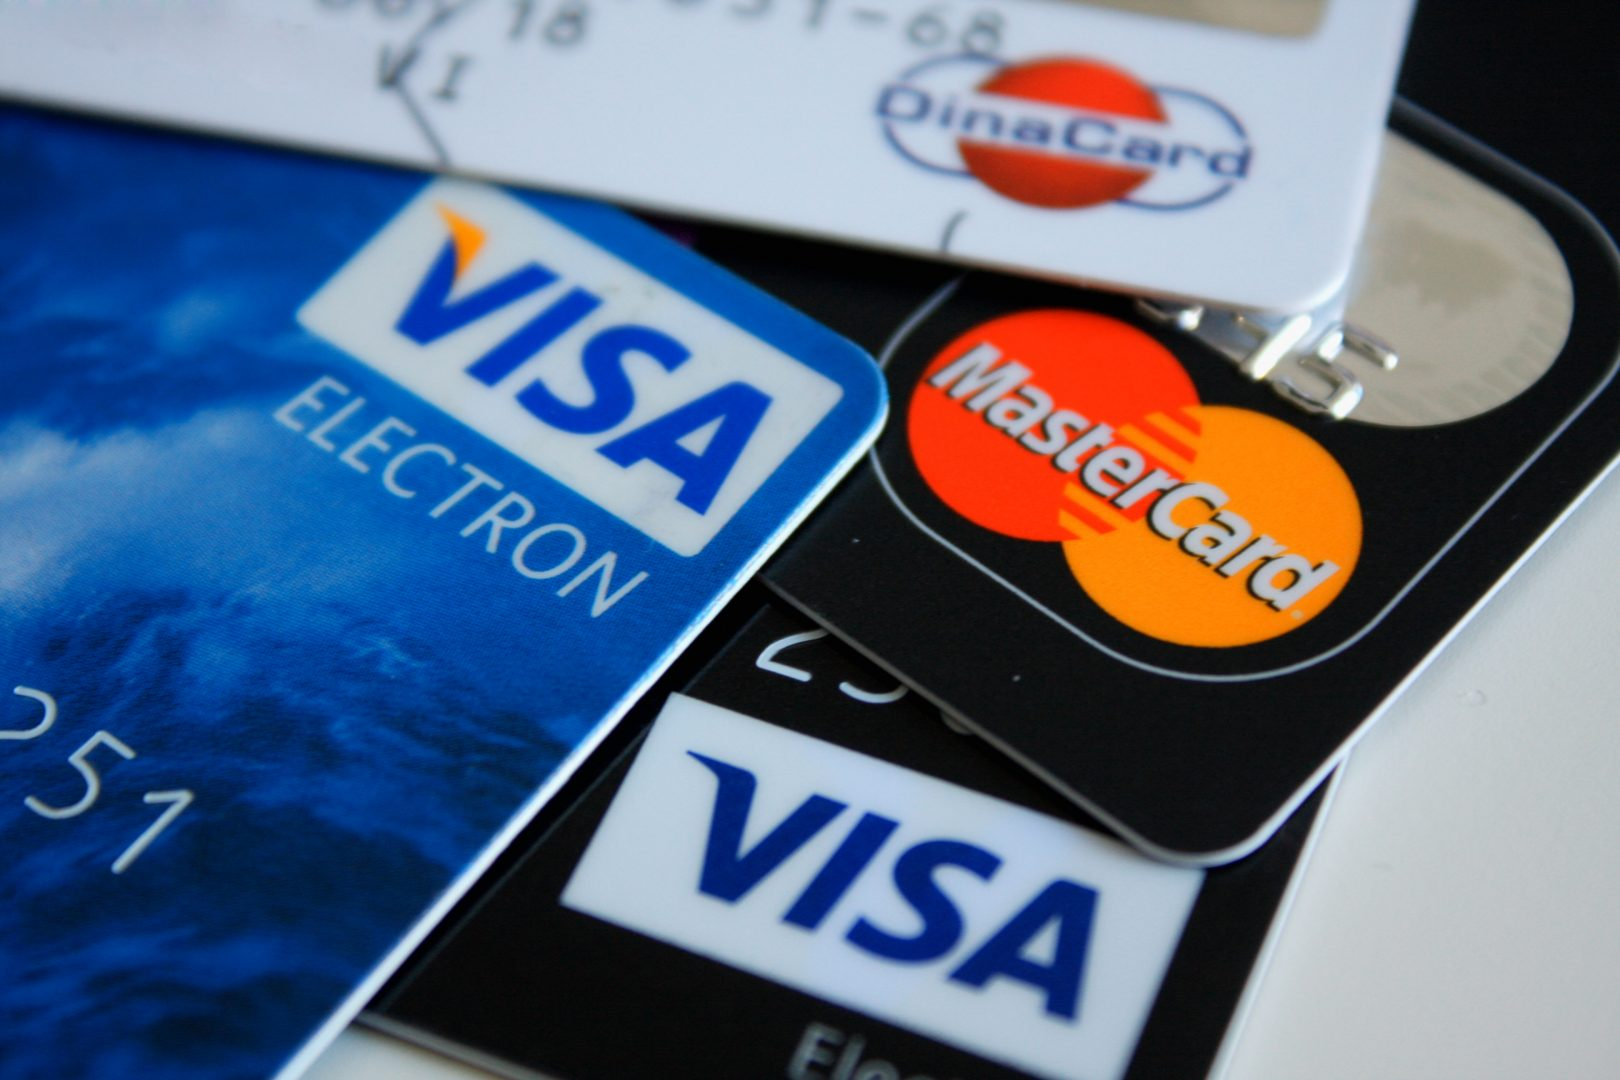 (P) Ce este o platformă de comparare a creditelor online?